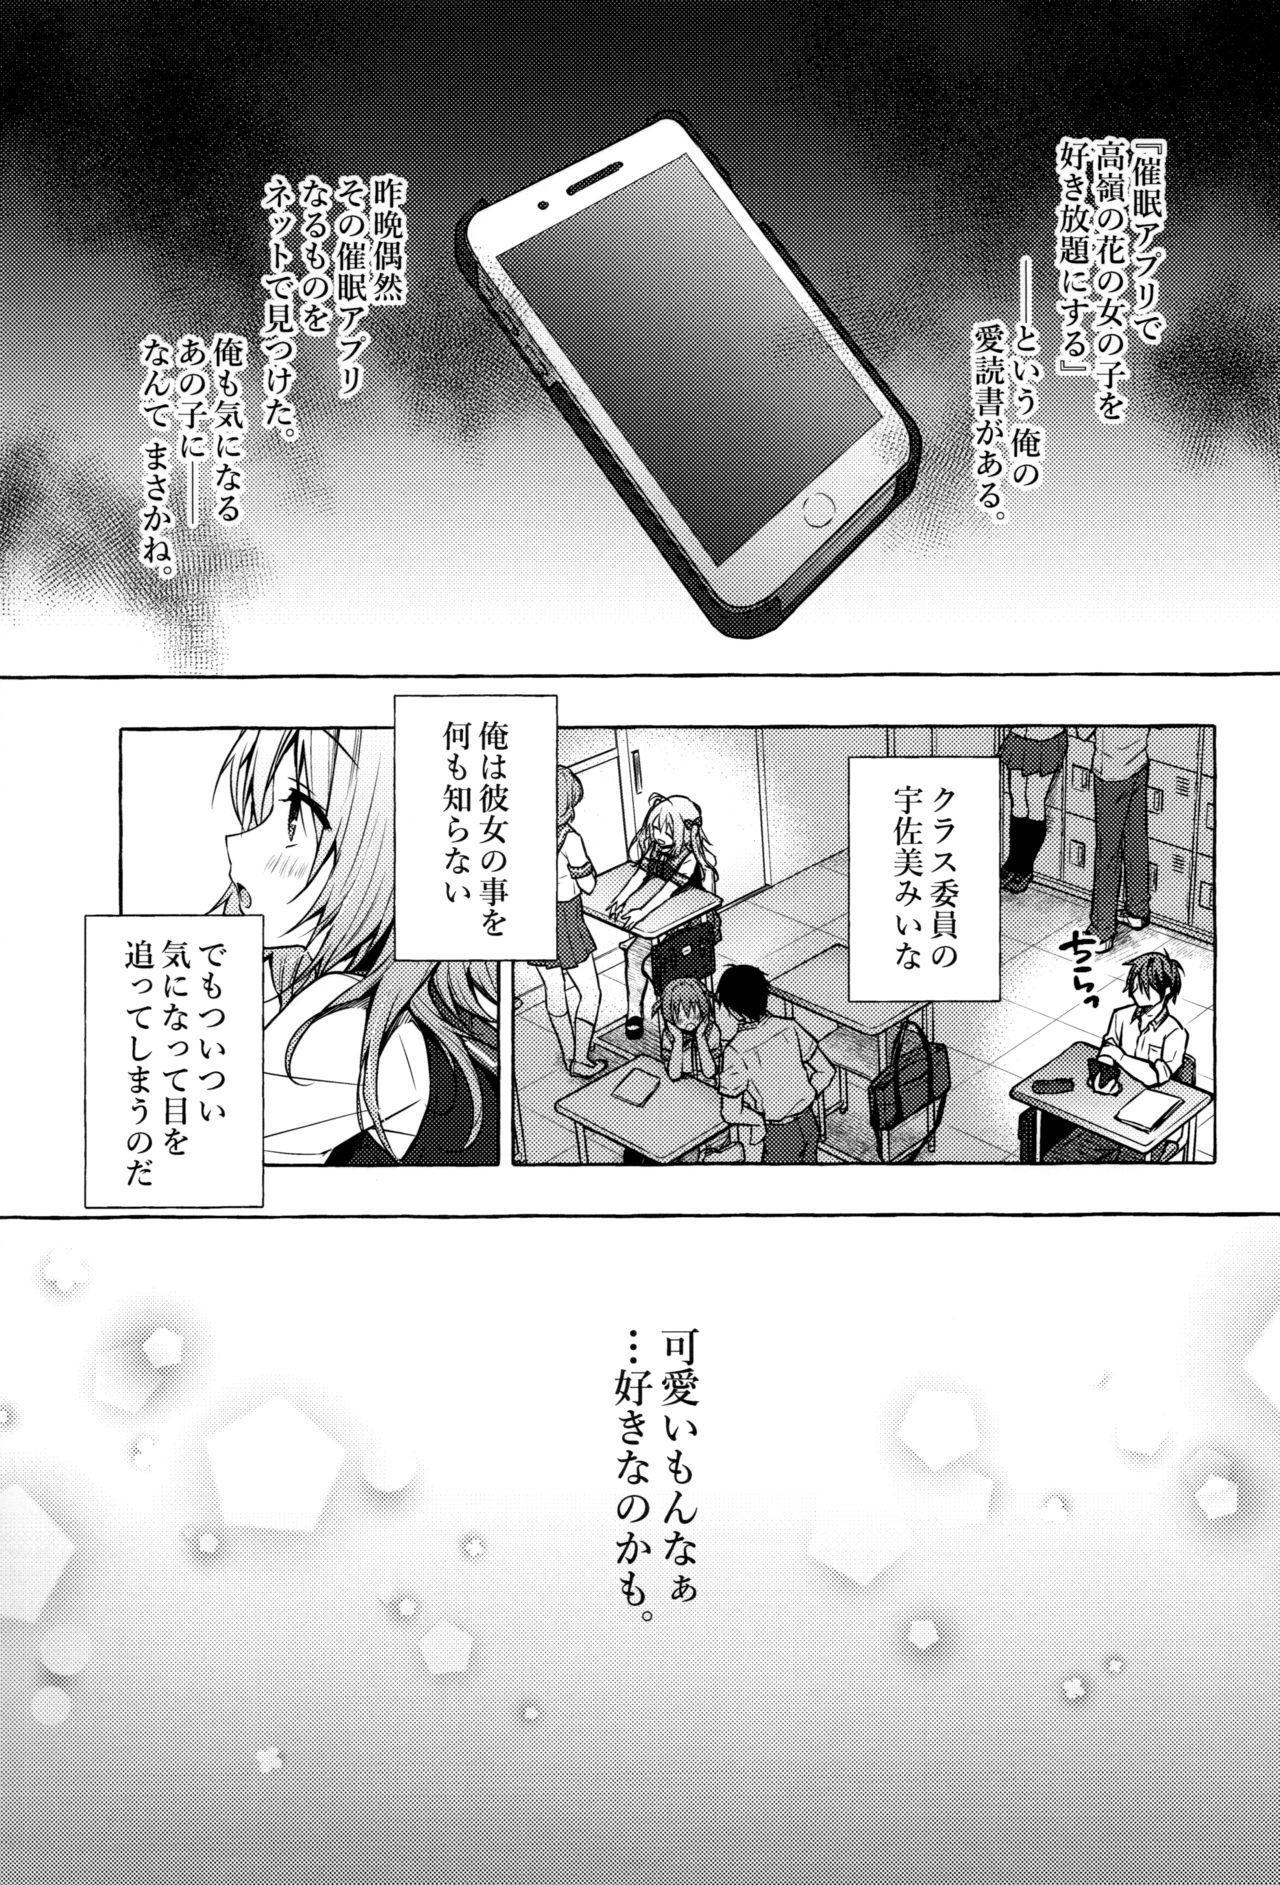 (C96) [Kinokonomi (konomi)] Saimin Usami-san -Nyancologism 2- 3